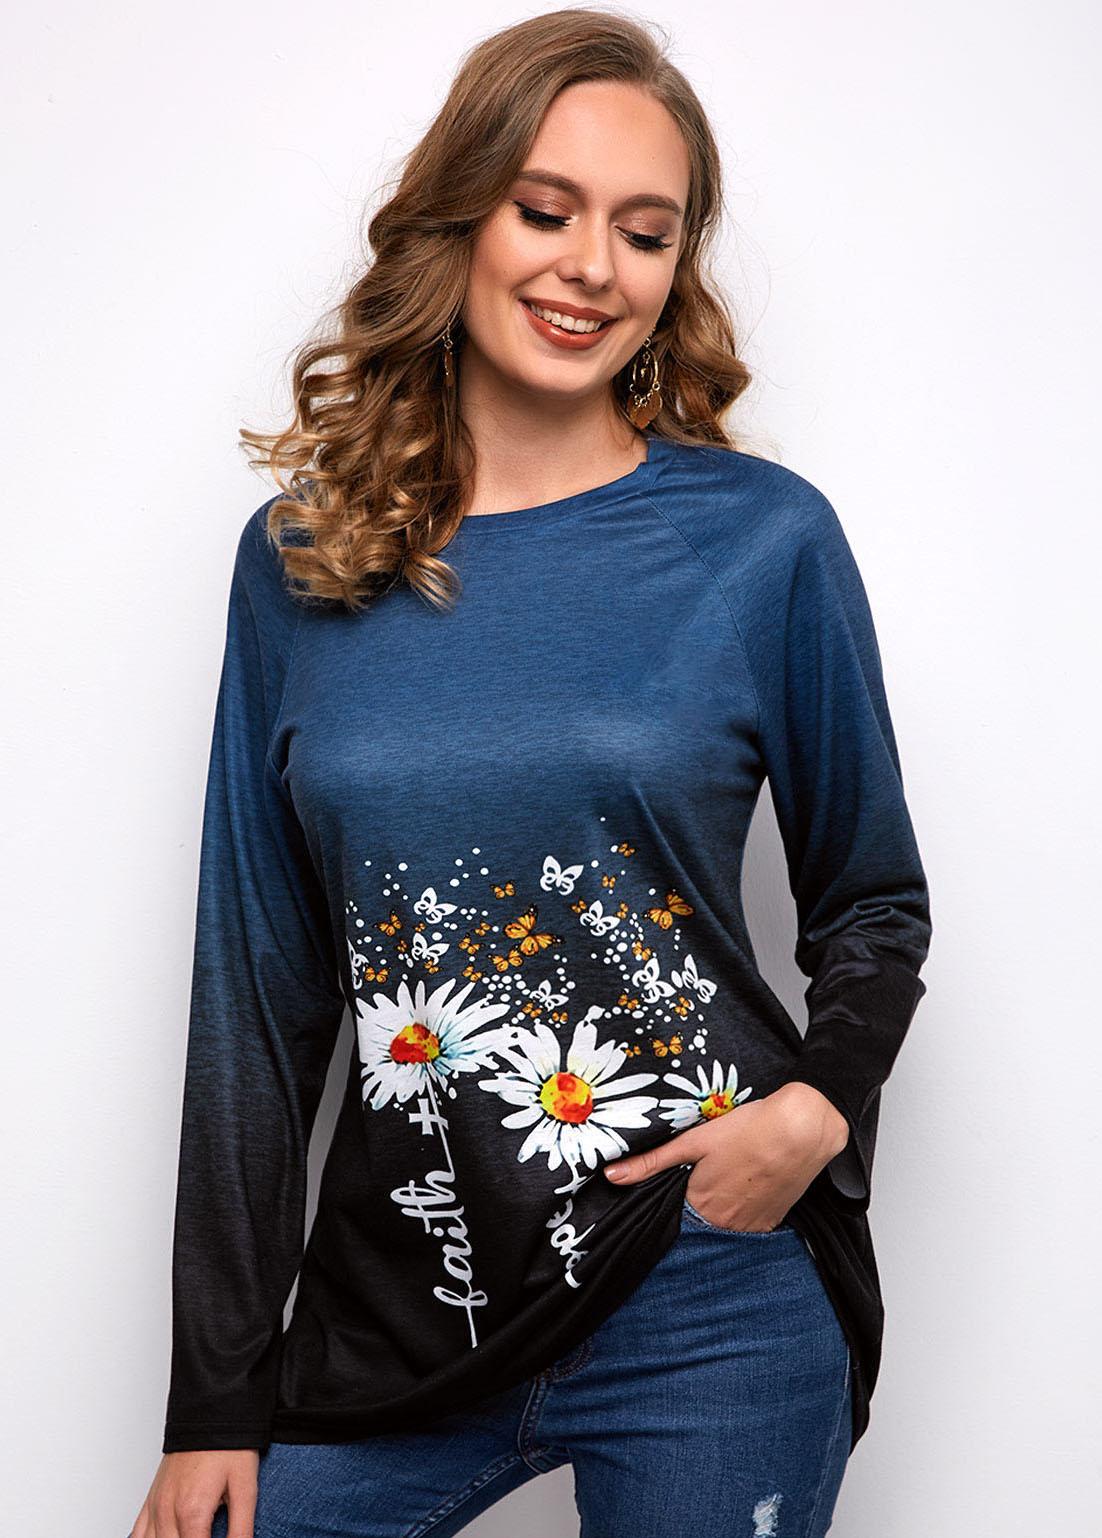 Daisy Print Round Neck Long Sleeve T Shirt